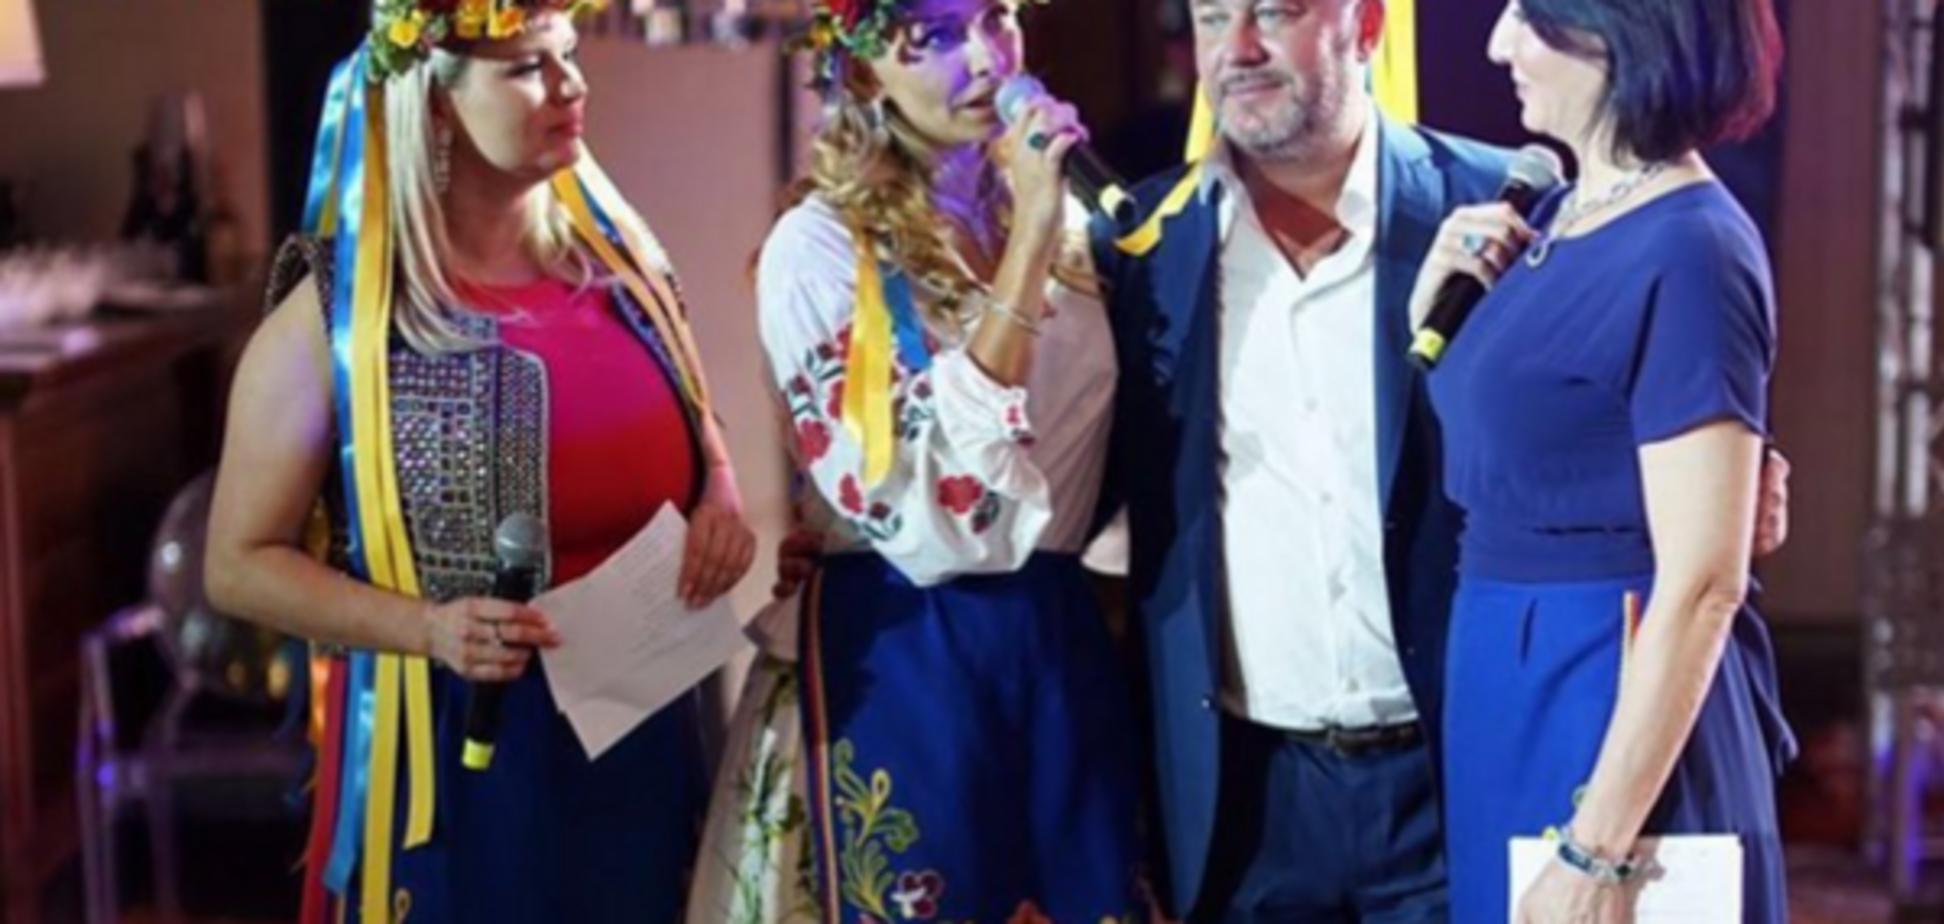 Татьяна Навка, вышиванка, фото